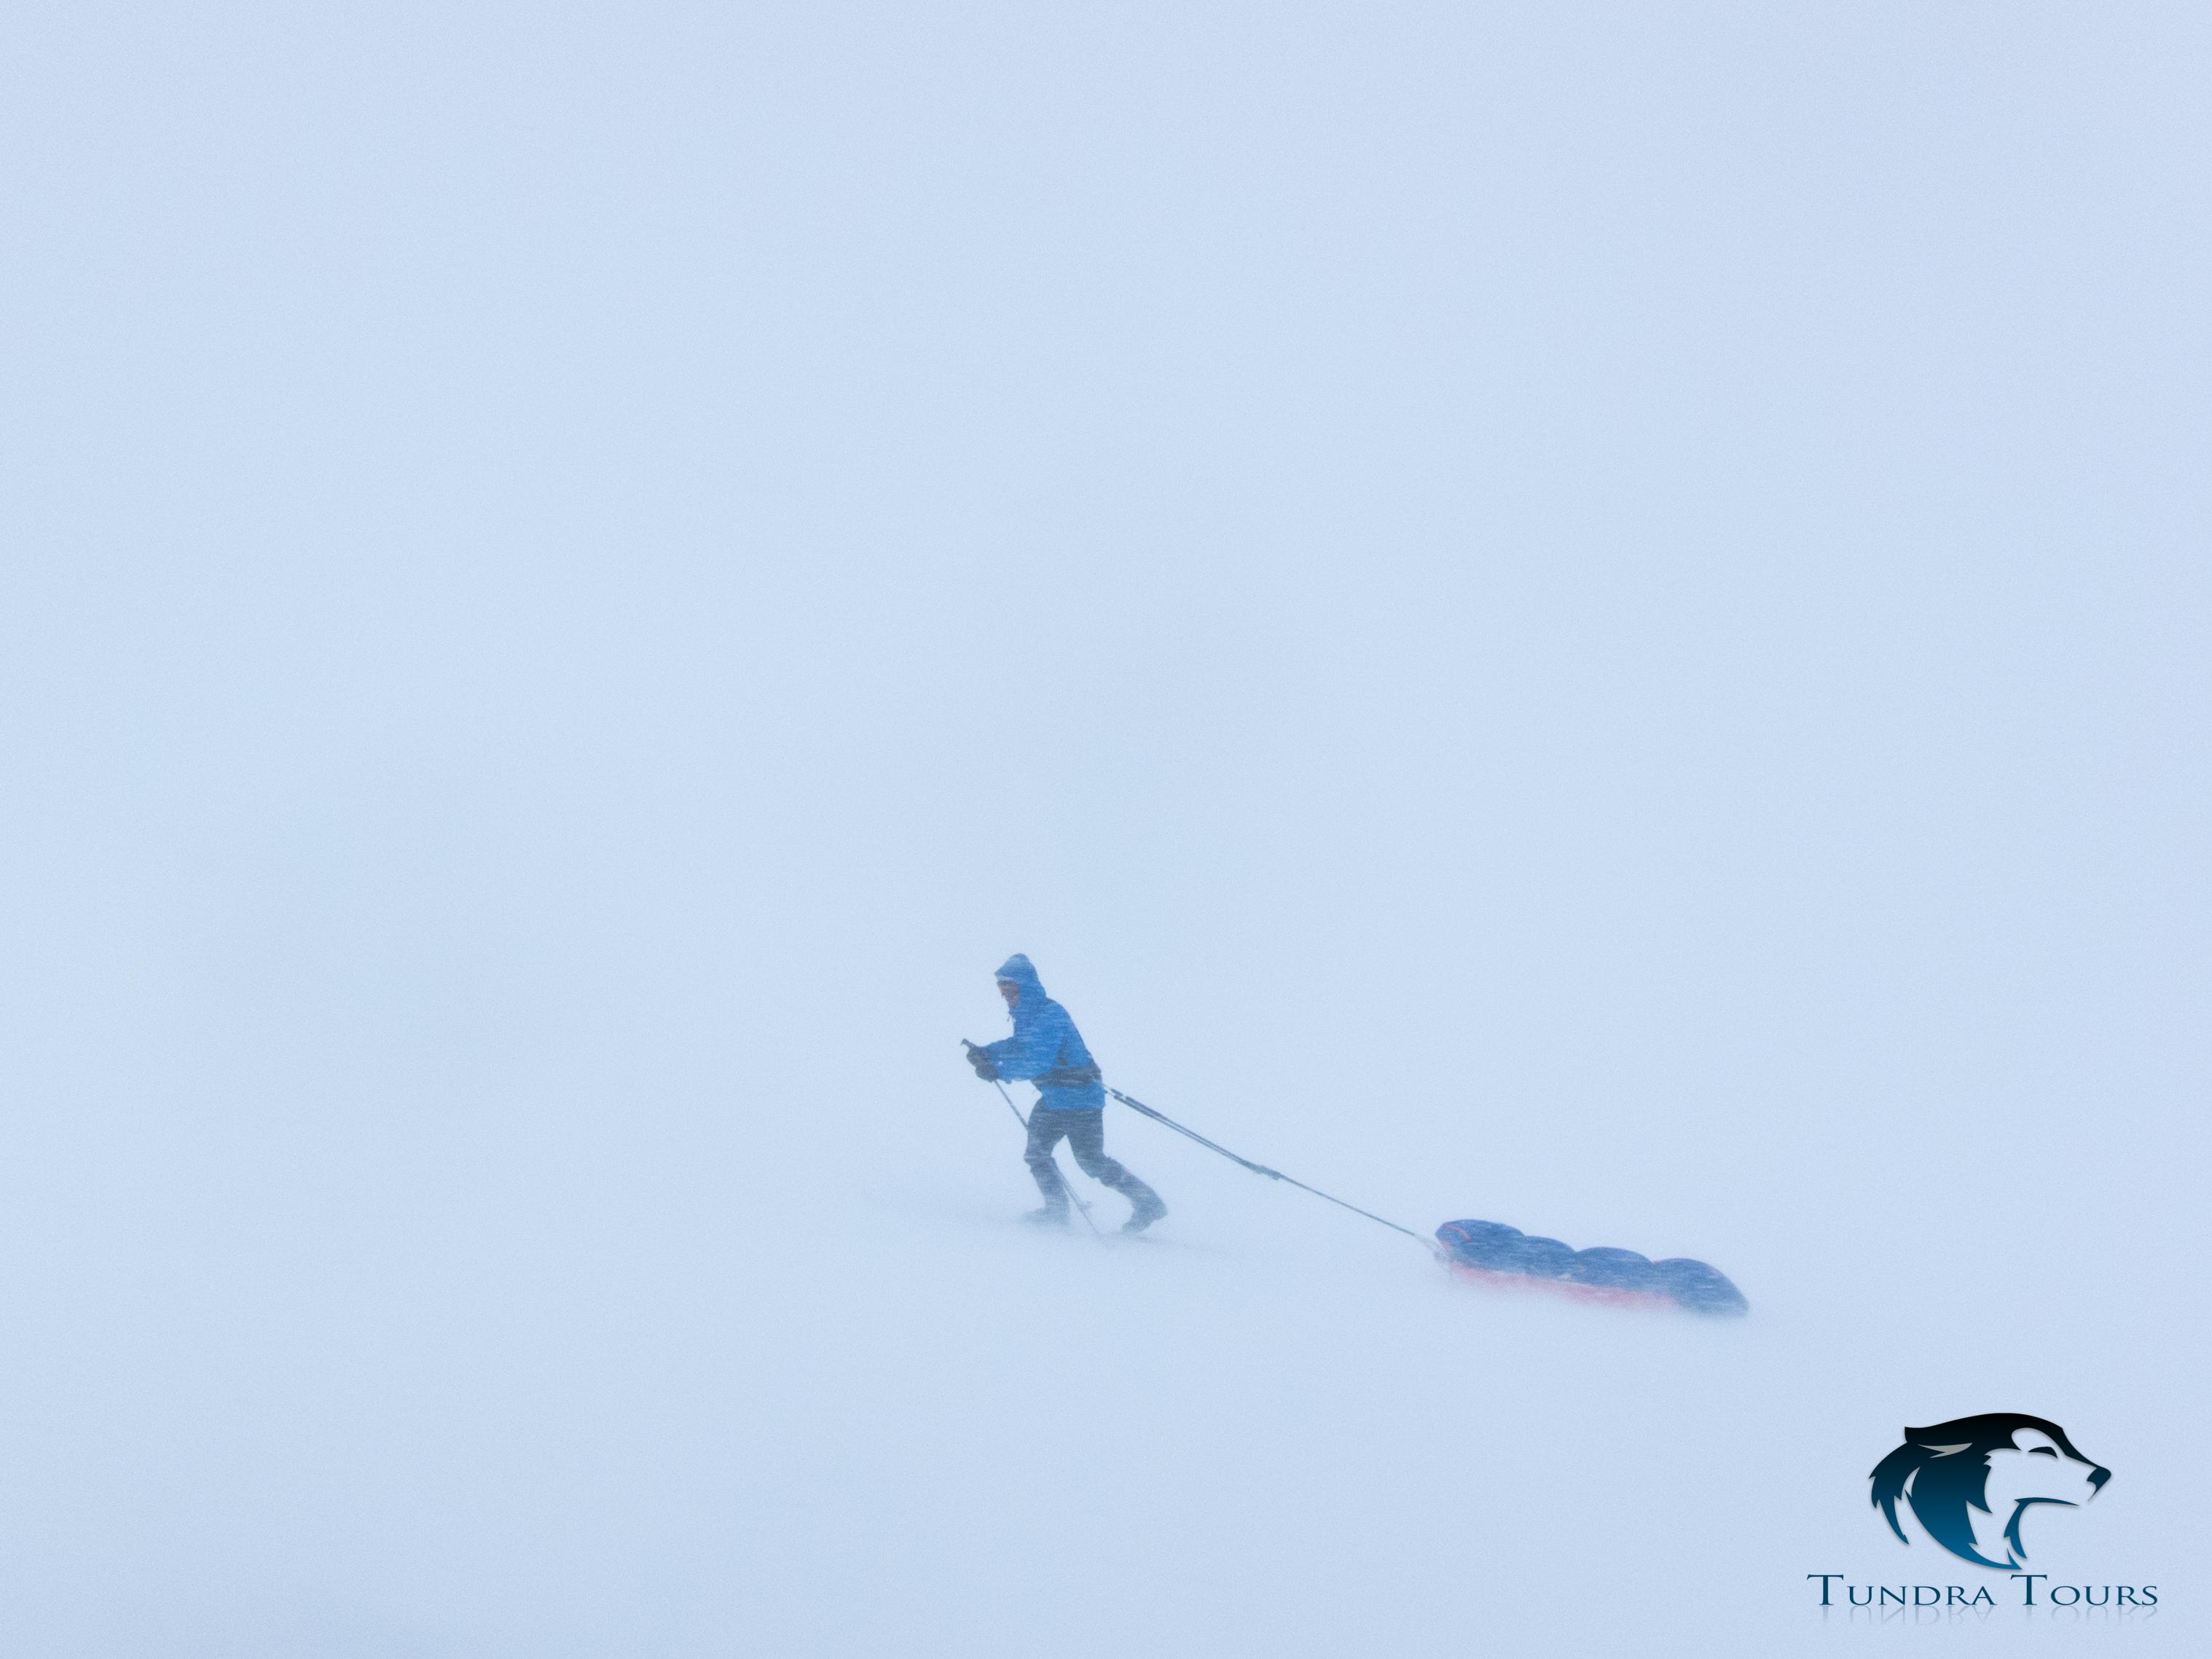 Tundra Tours 23.03.17 - 24.03.17-3